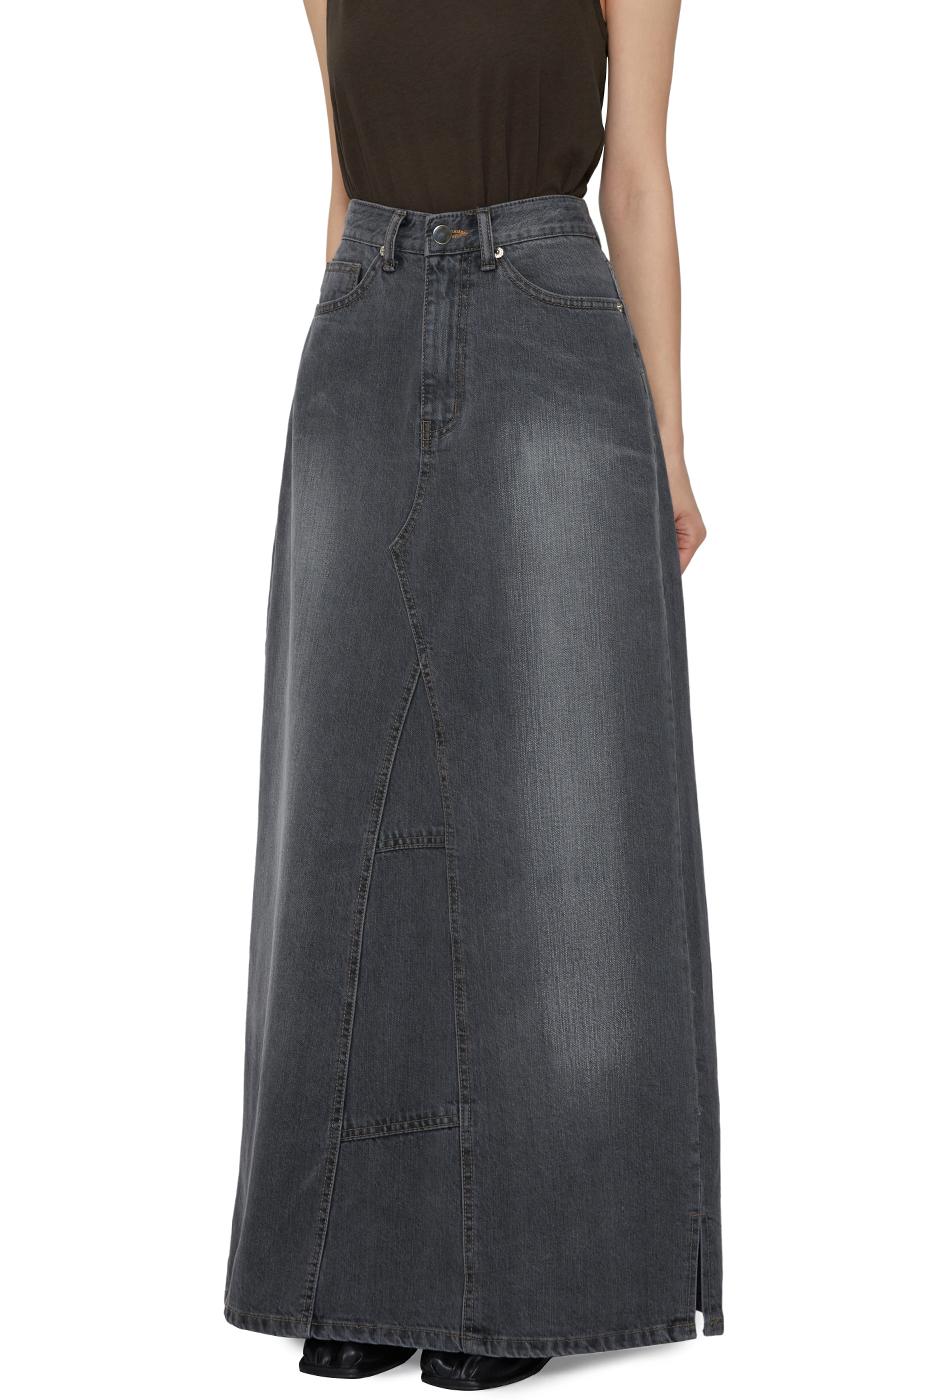 Cheat denim maxi long skirt